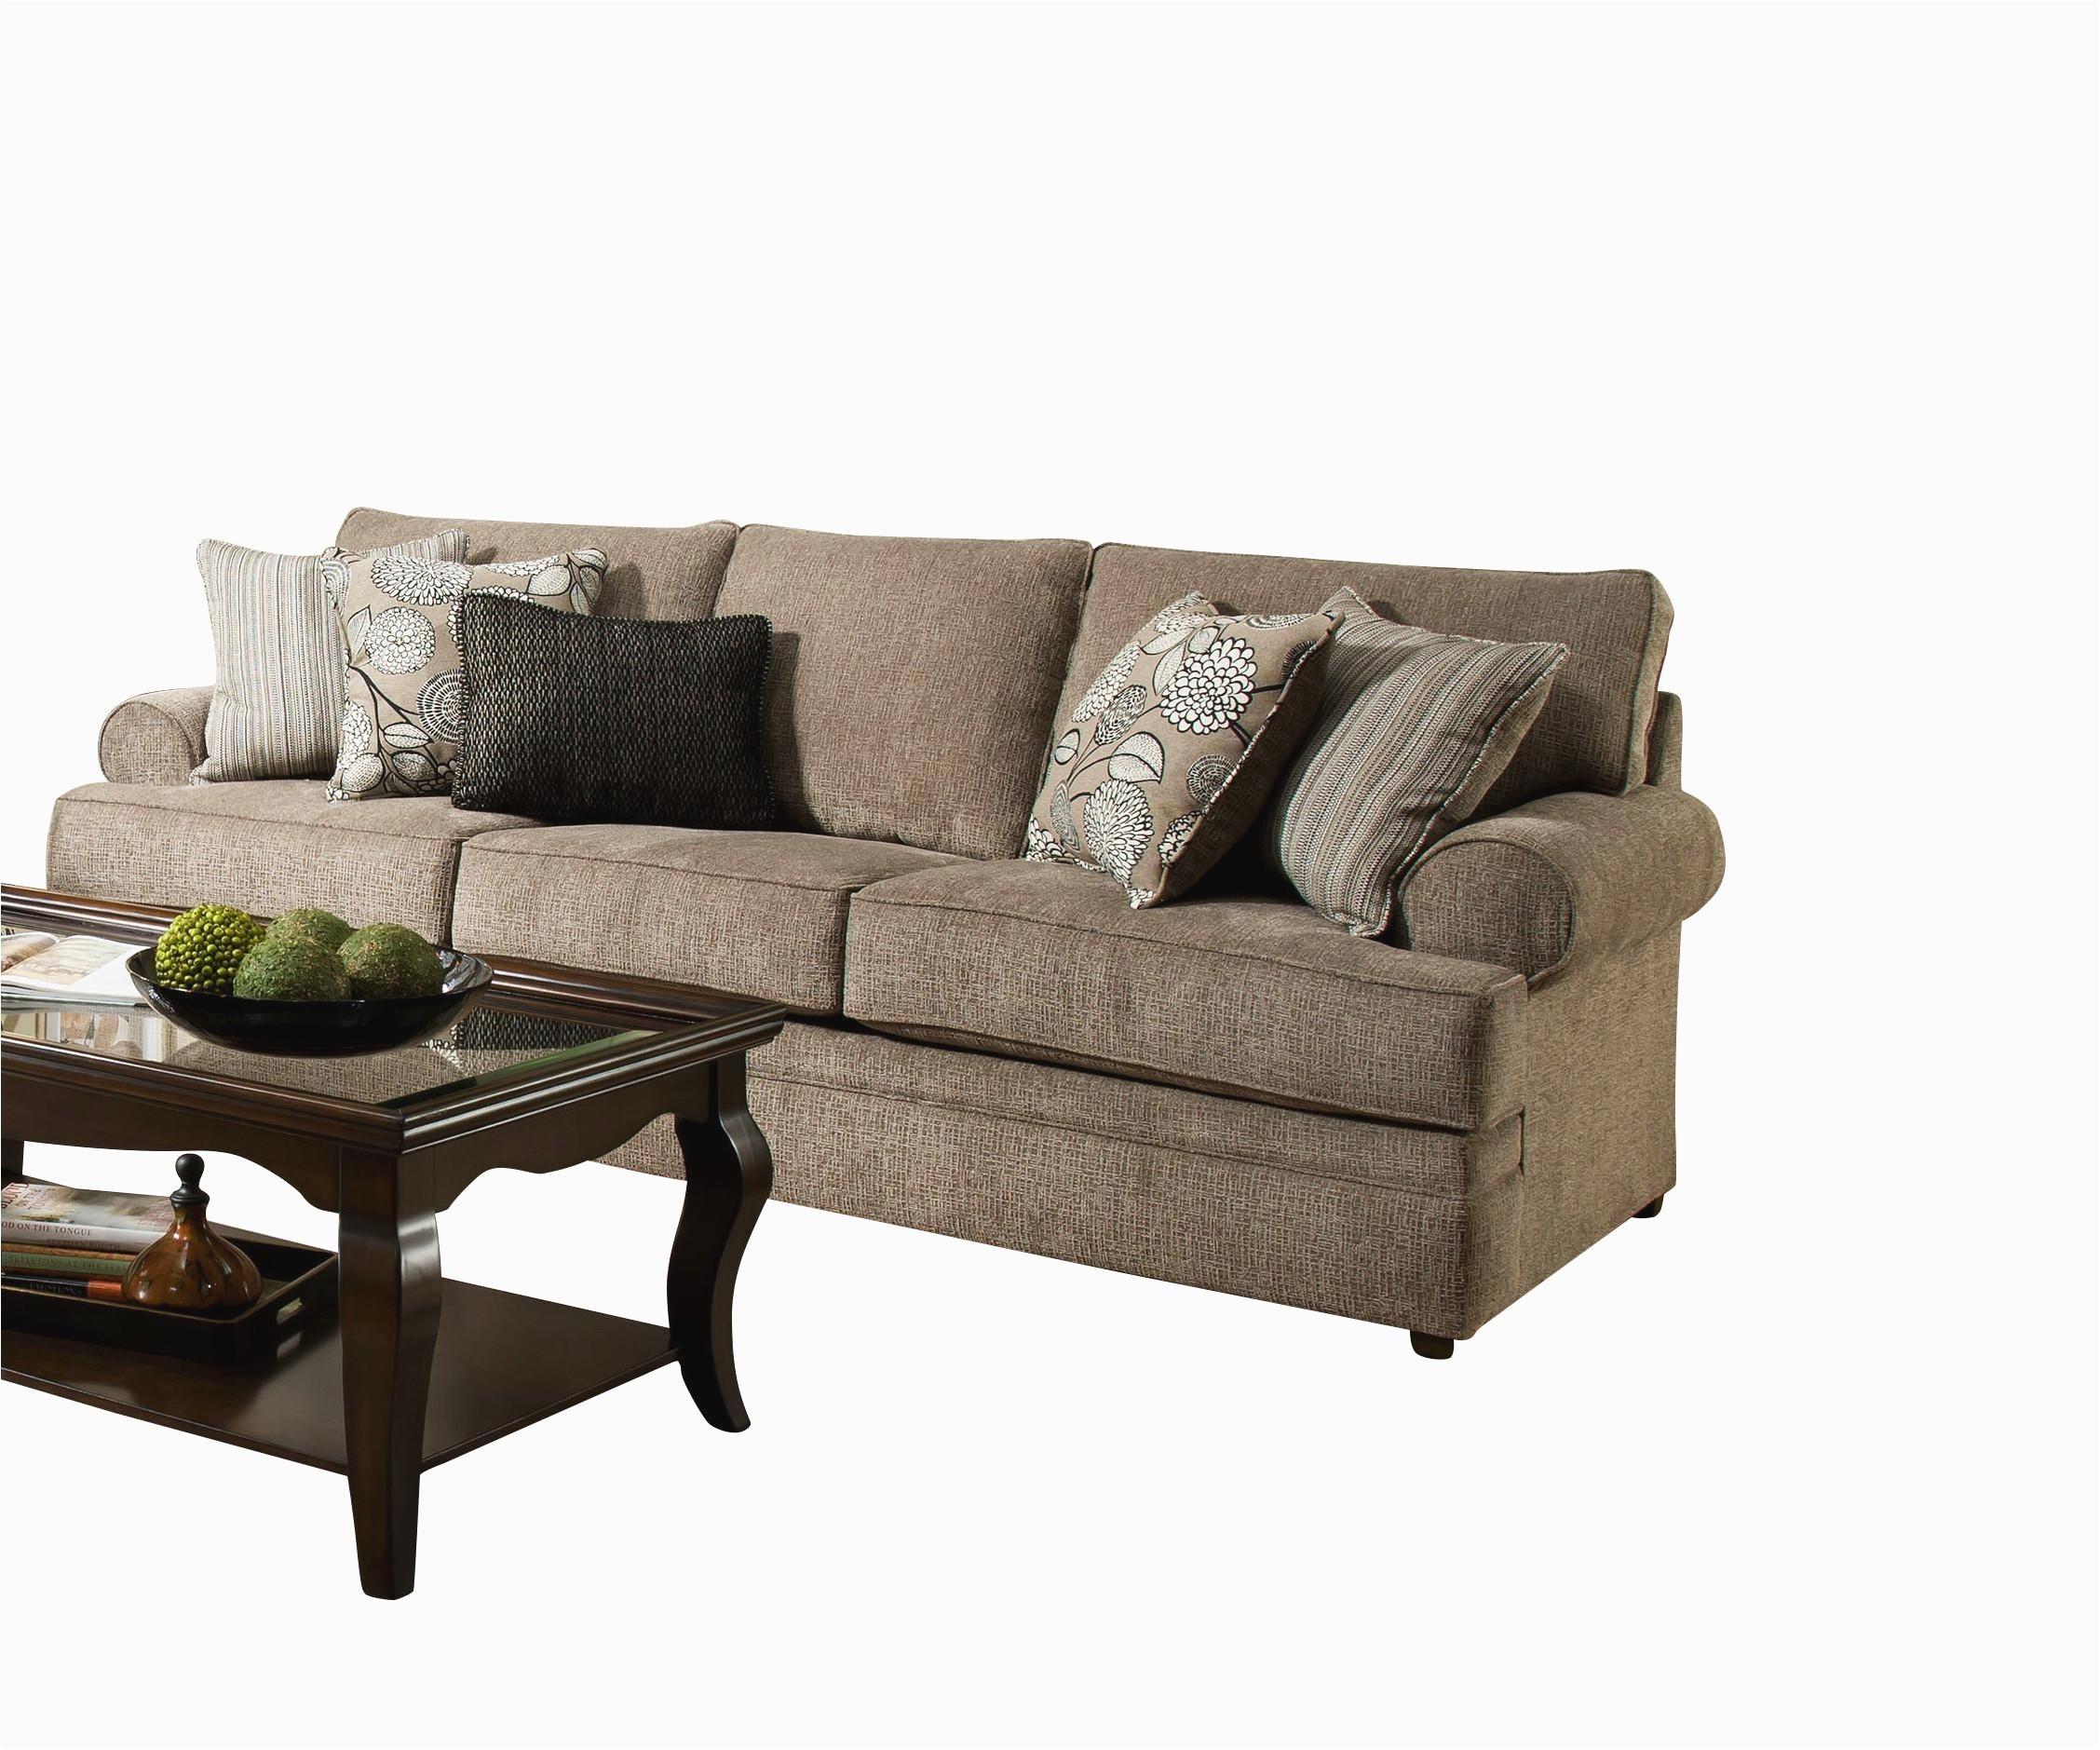 full size of home design macys tufted sofa elegant fresh macys furniture leather sofa 35 size